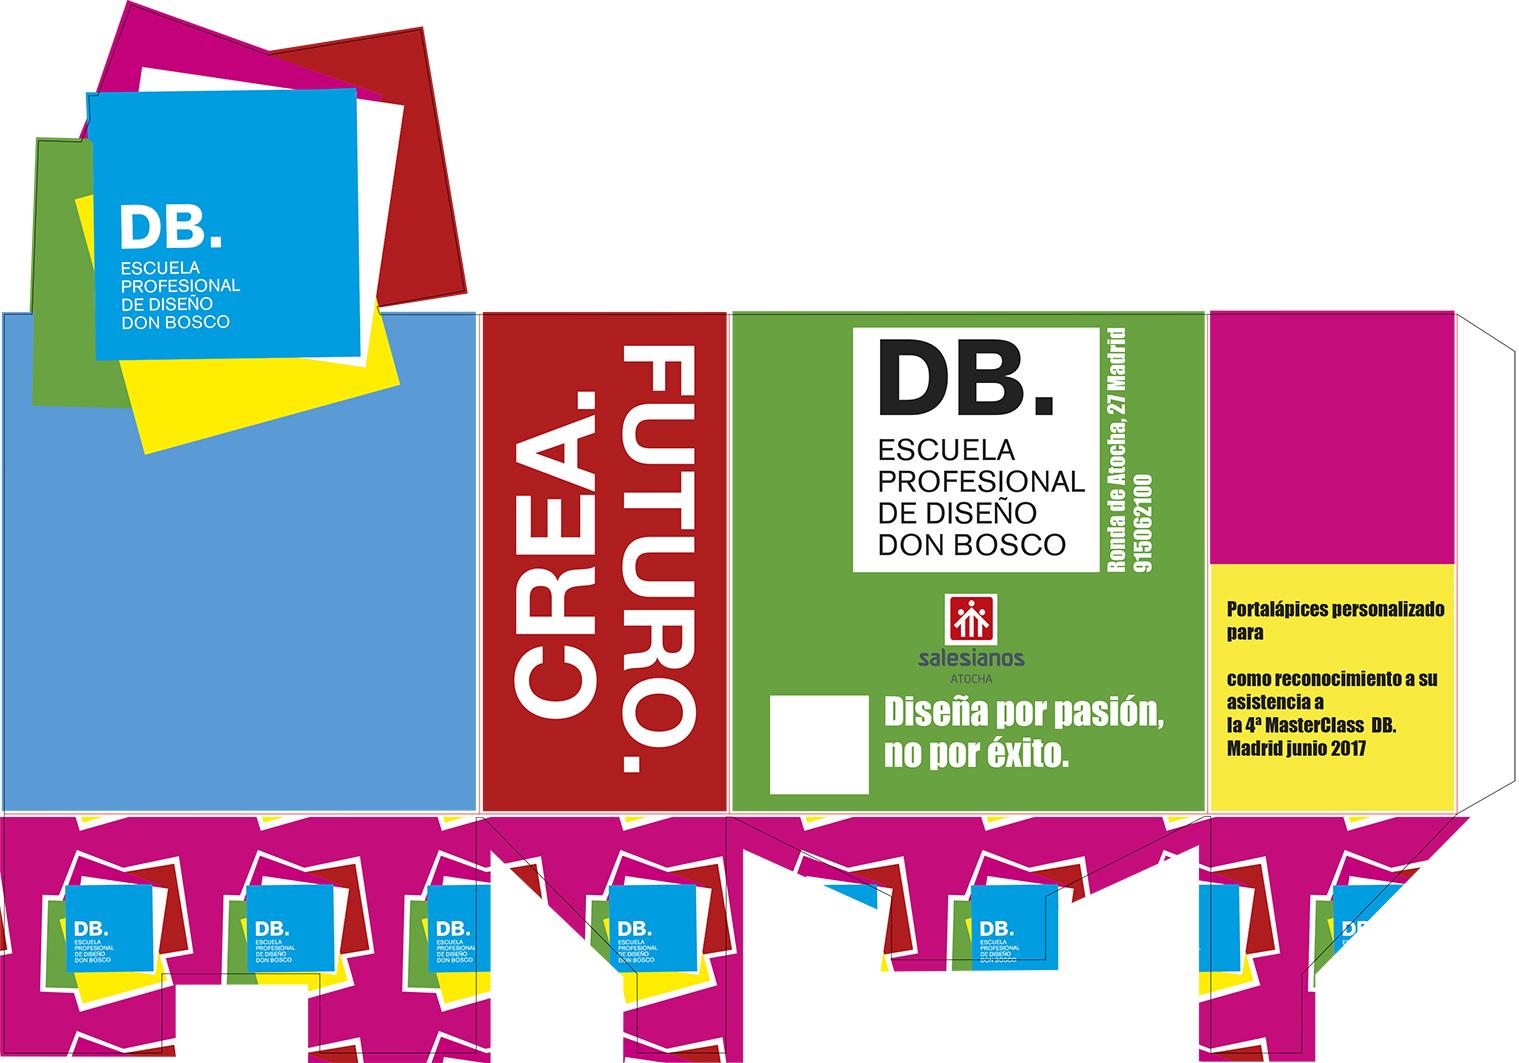 Portálapices Promocional DBMaestro 4ª Masterclass